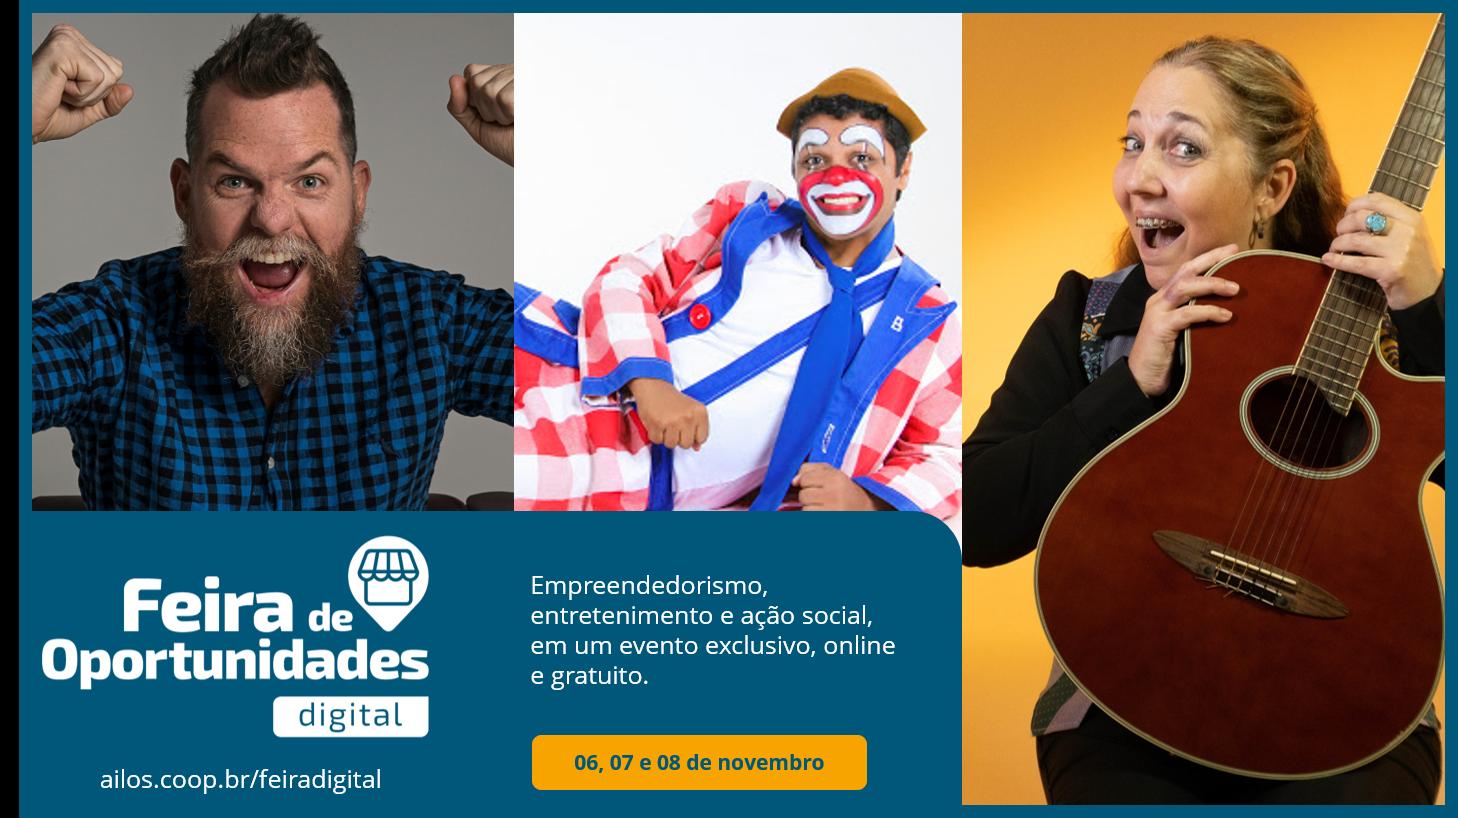 Feira de Oportunidades Digital da Viacredi Alto Vale reúne Marcos Piangers, Dazaranha, Biribinha e Nana Toledo